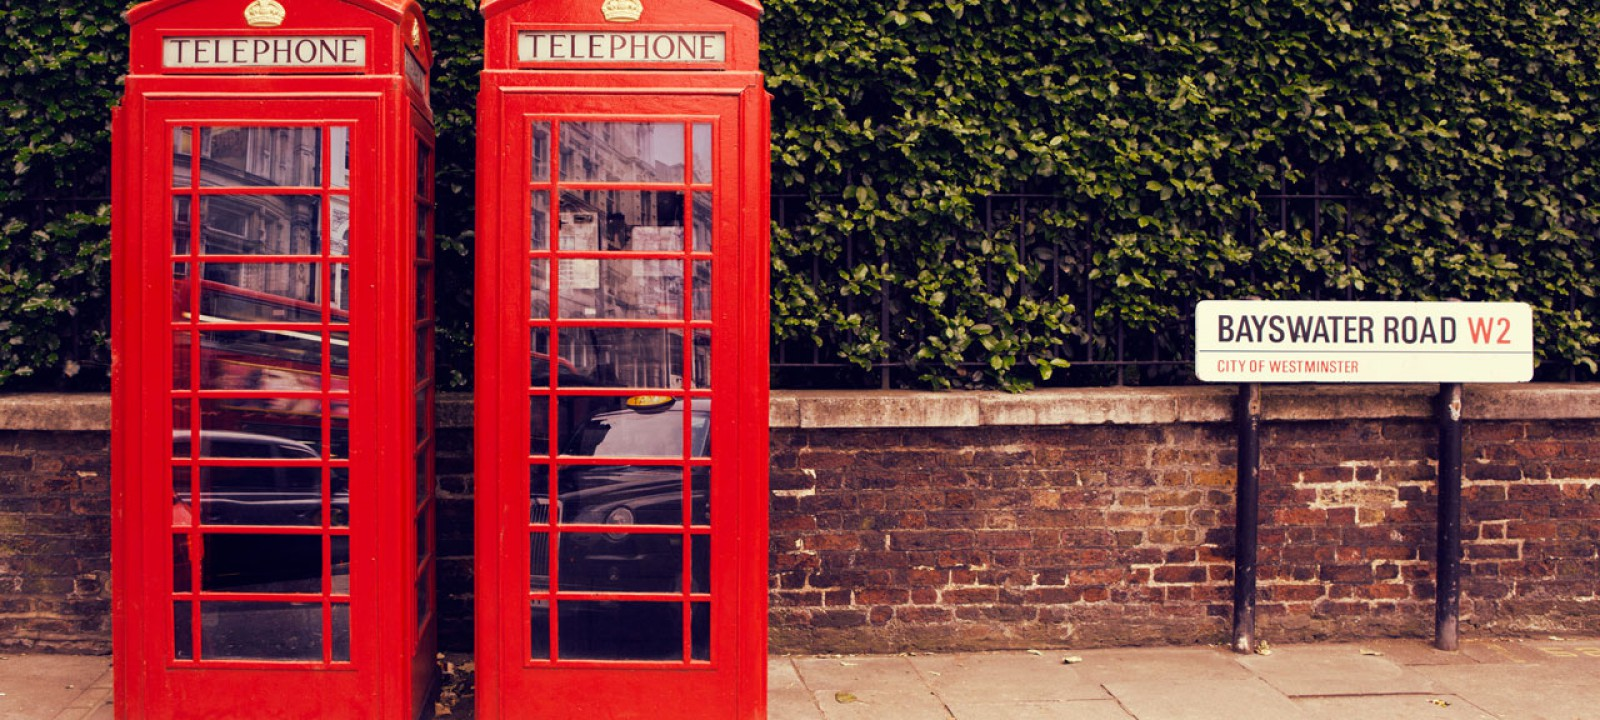 1280x720_phoneboxes